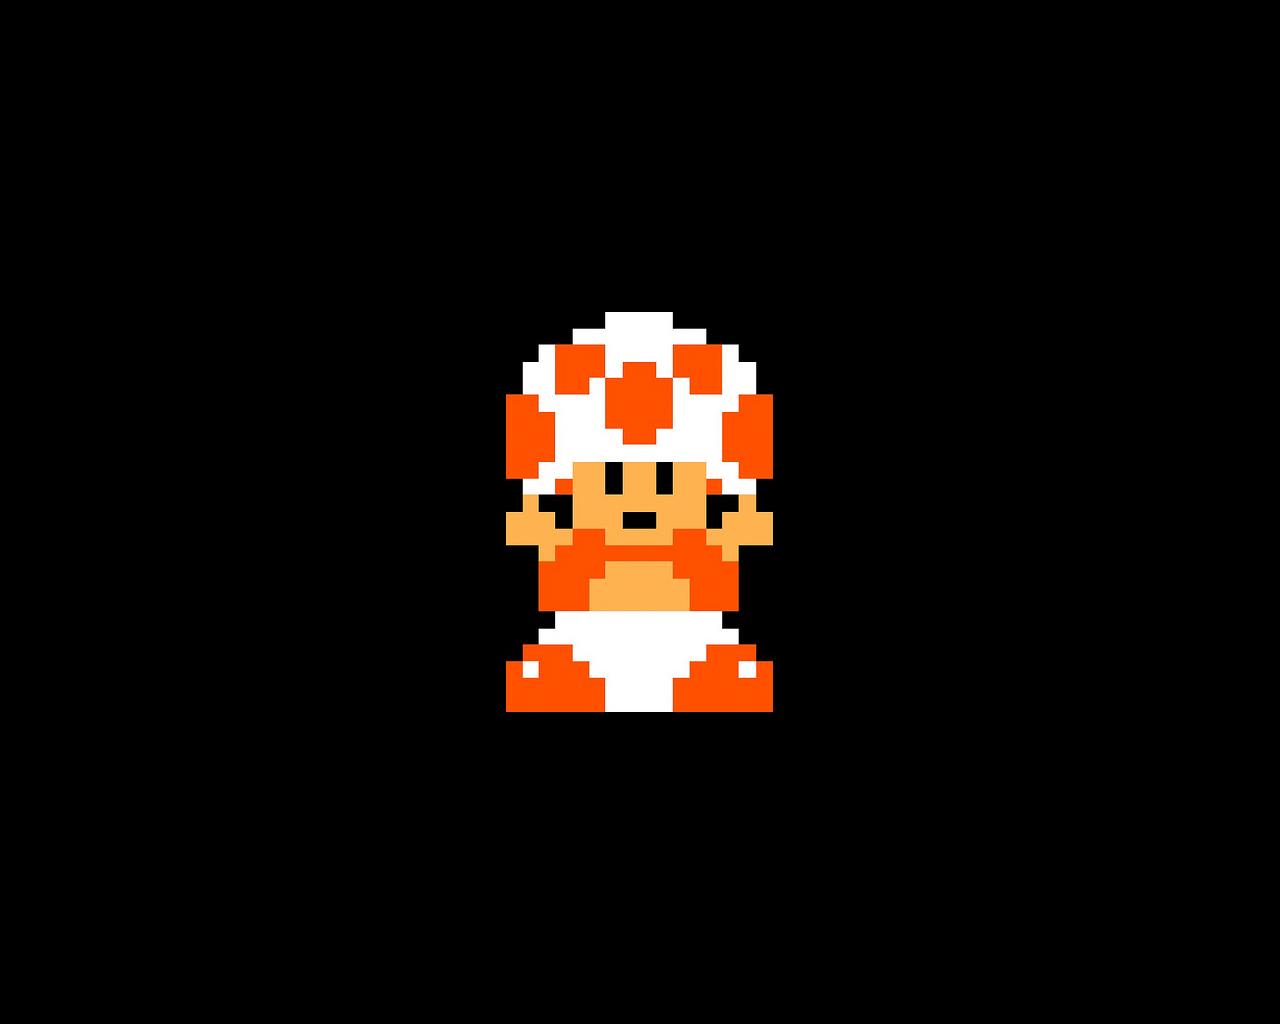 Shy Guy Iphone Wallpaper Fond D Ecran Toad Pixel Art Jeux Video Info